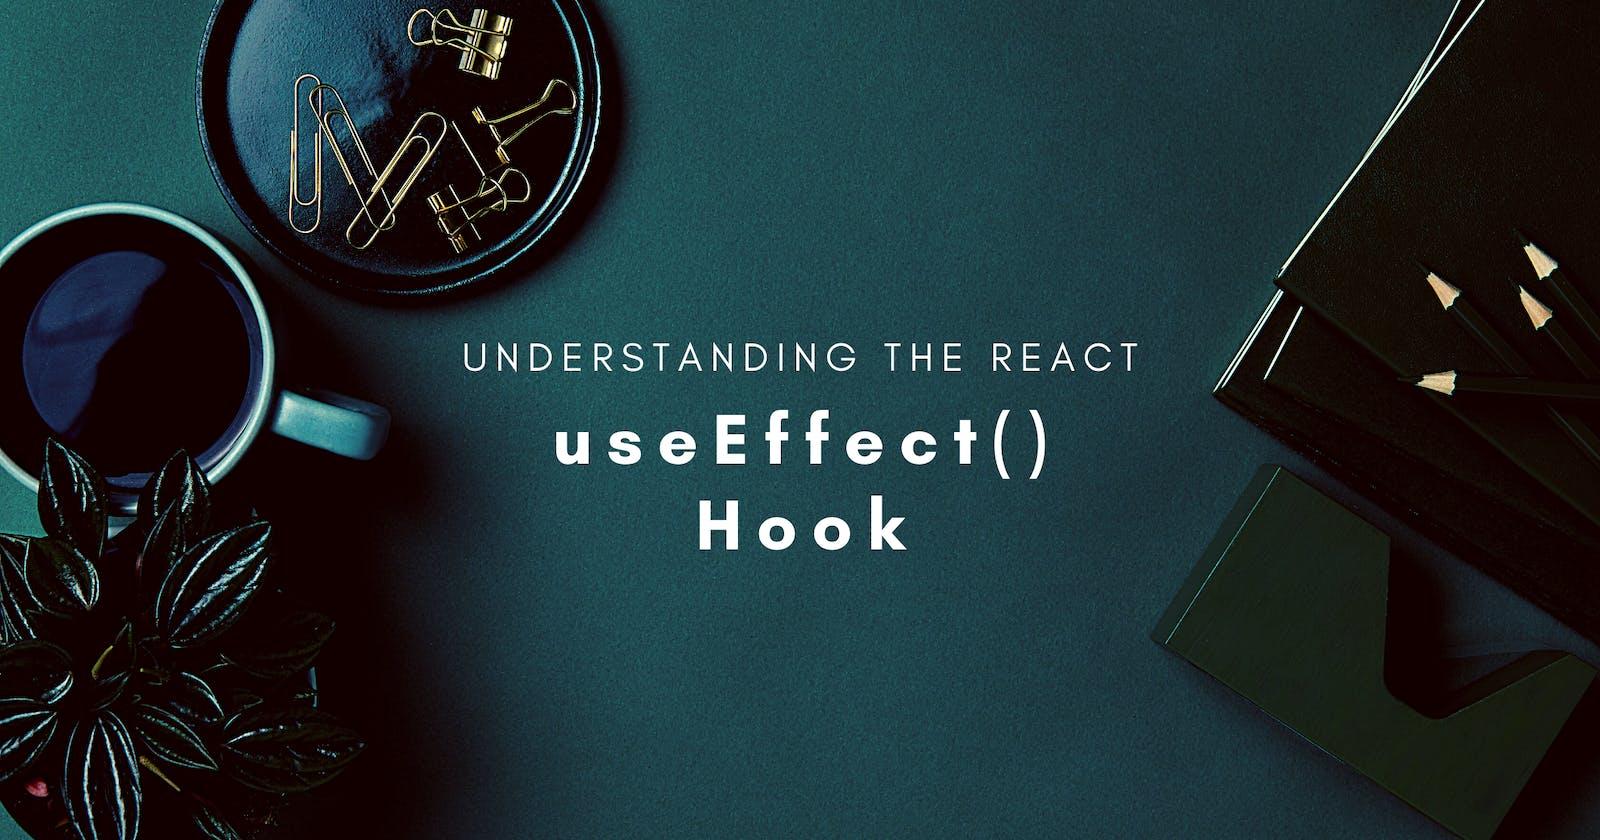 Understanding the React useEffect() Hook